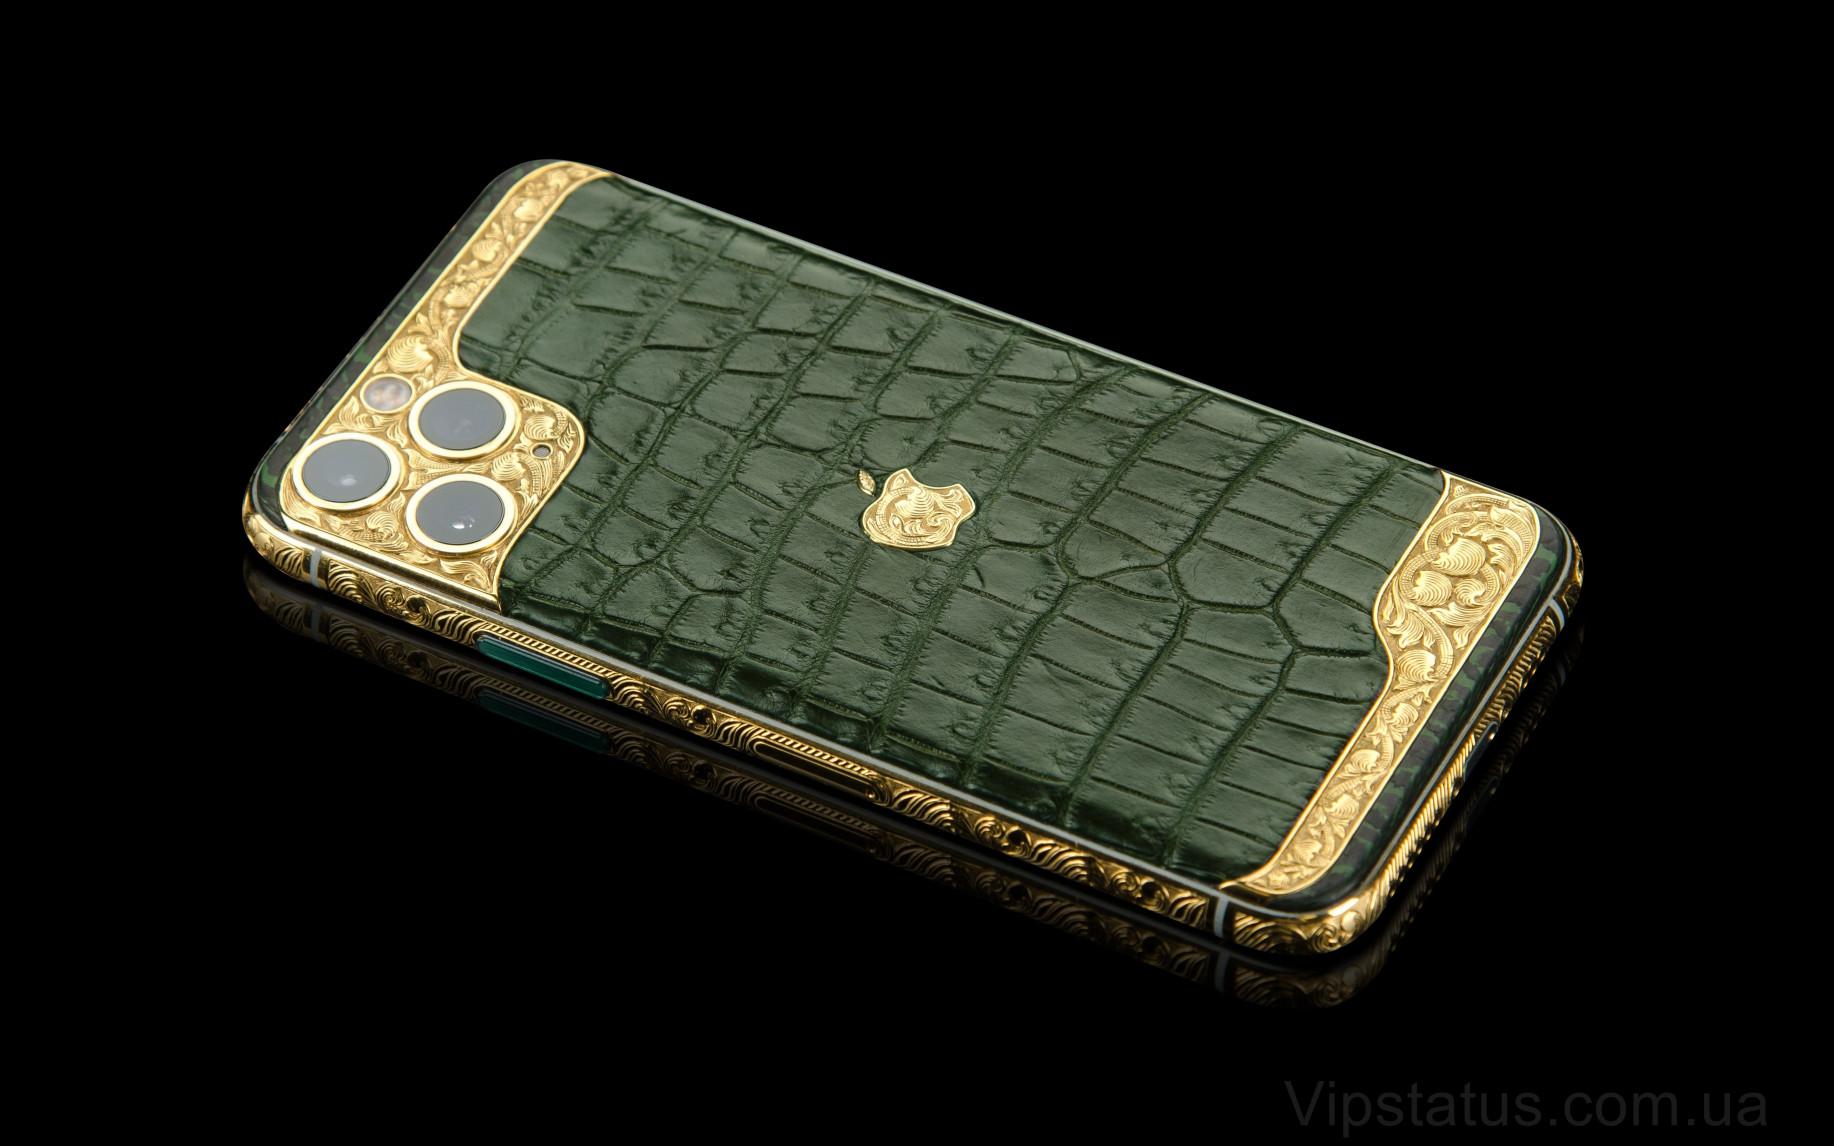 Elite Eastern Emerald IPHONE 11 PRO 512 GB Eastern Emerald IPHONE 11 PRO 512 GB image 3